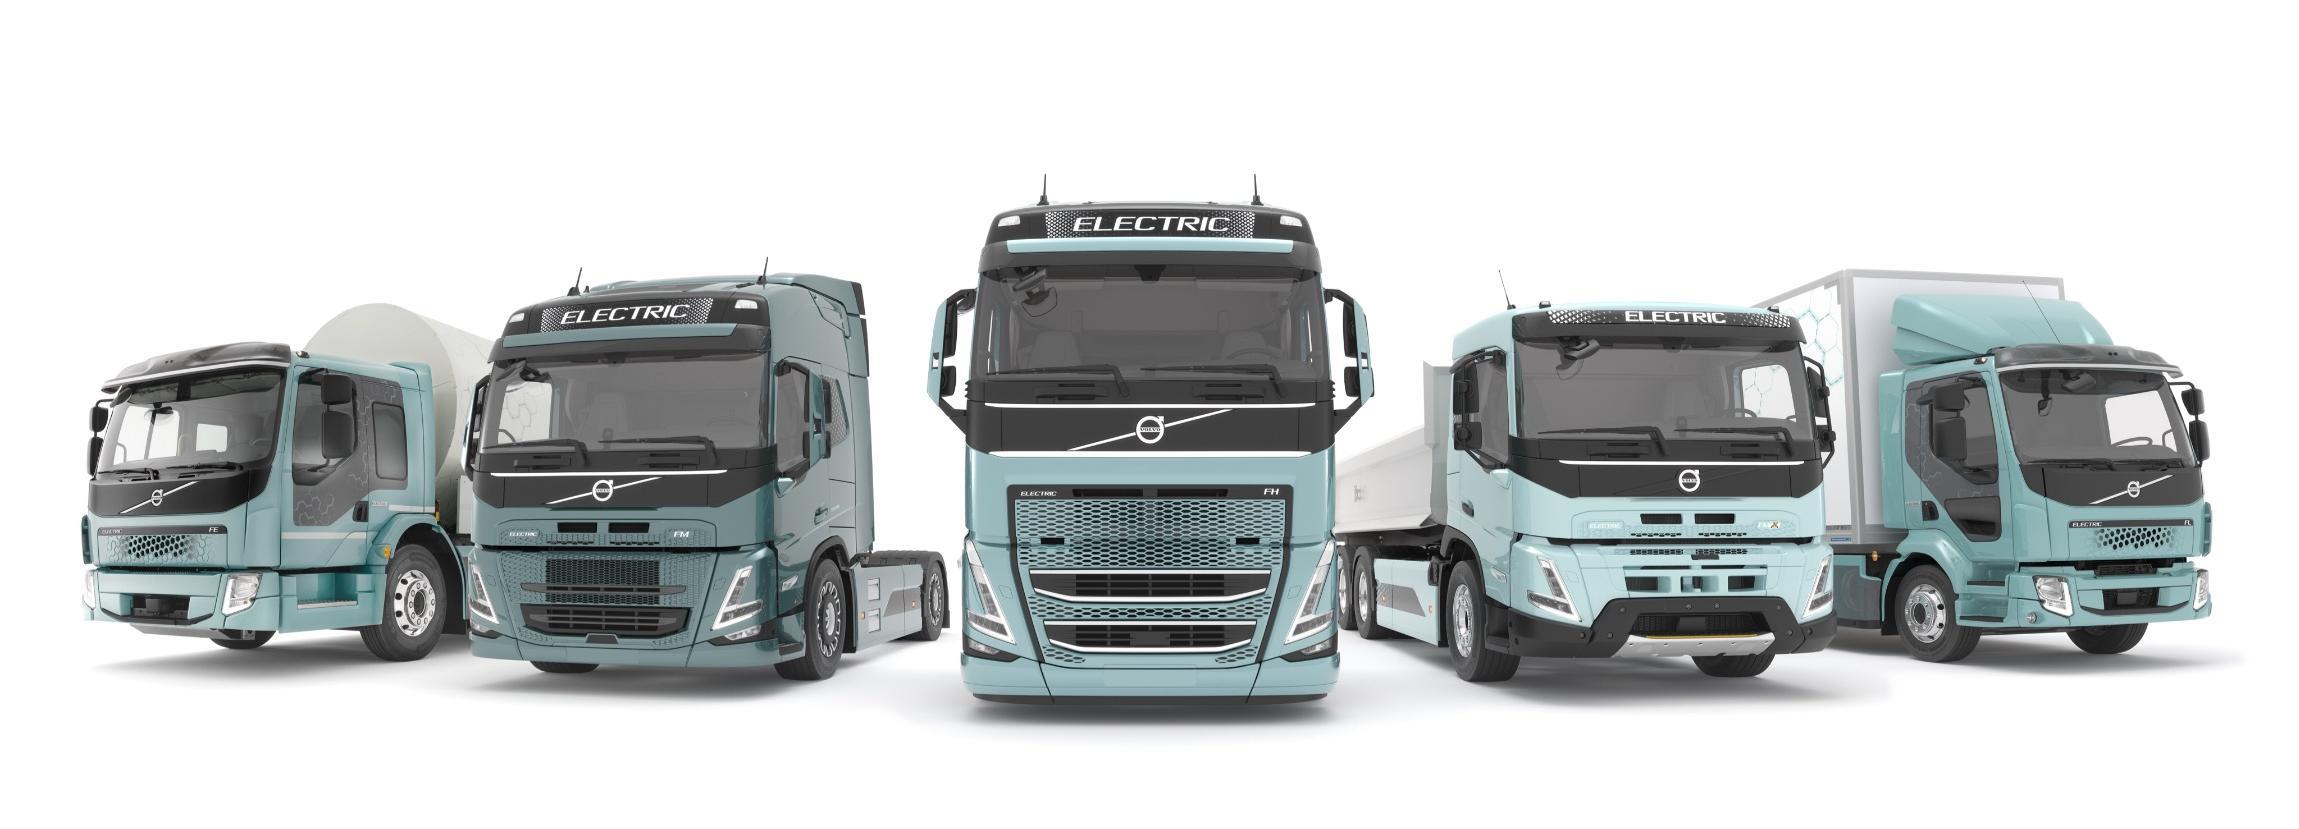 Volvo-Battery-Hydrogen-Trucks